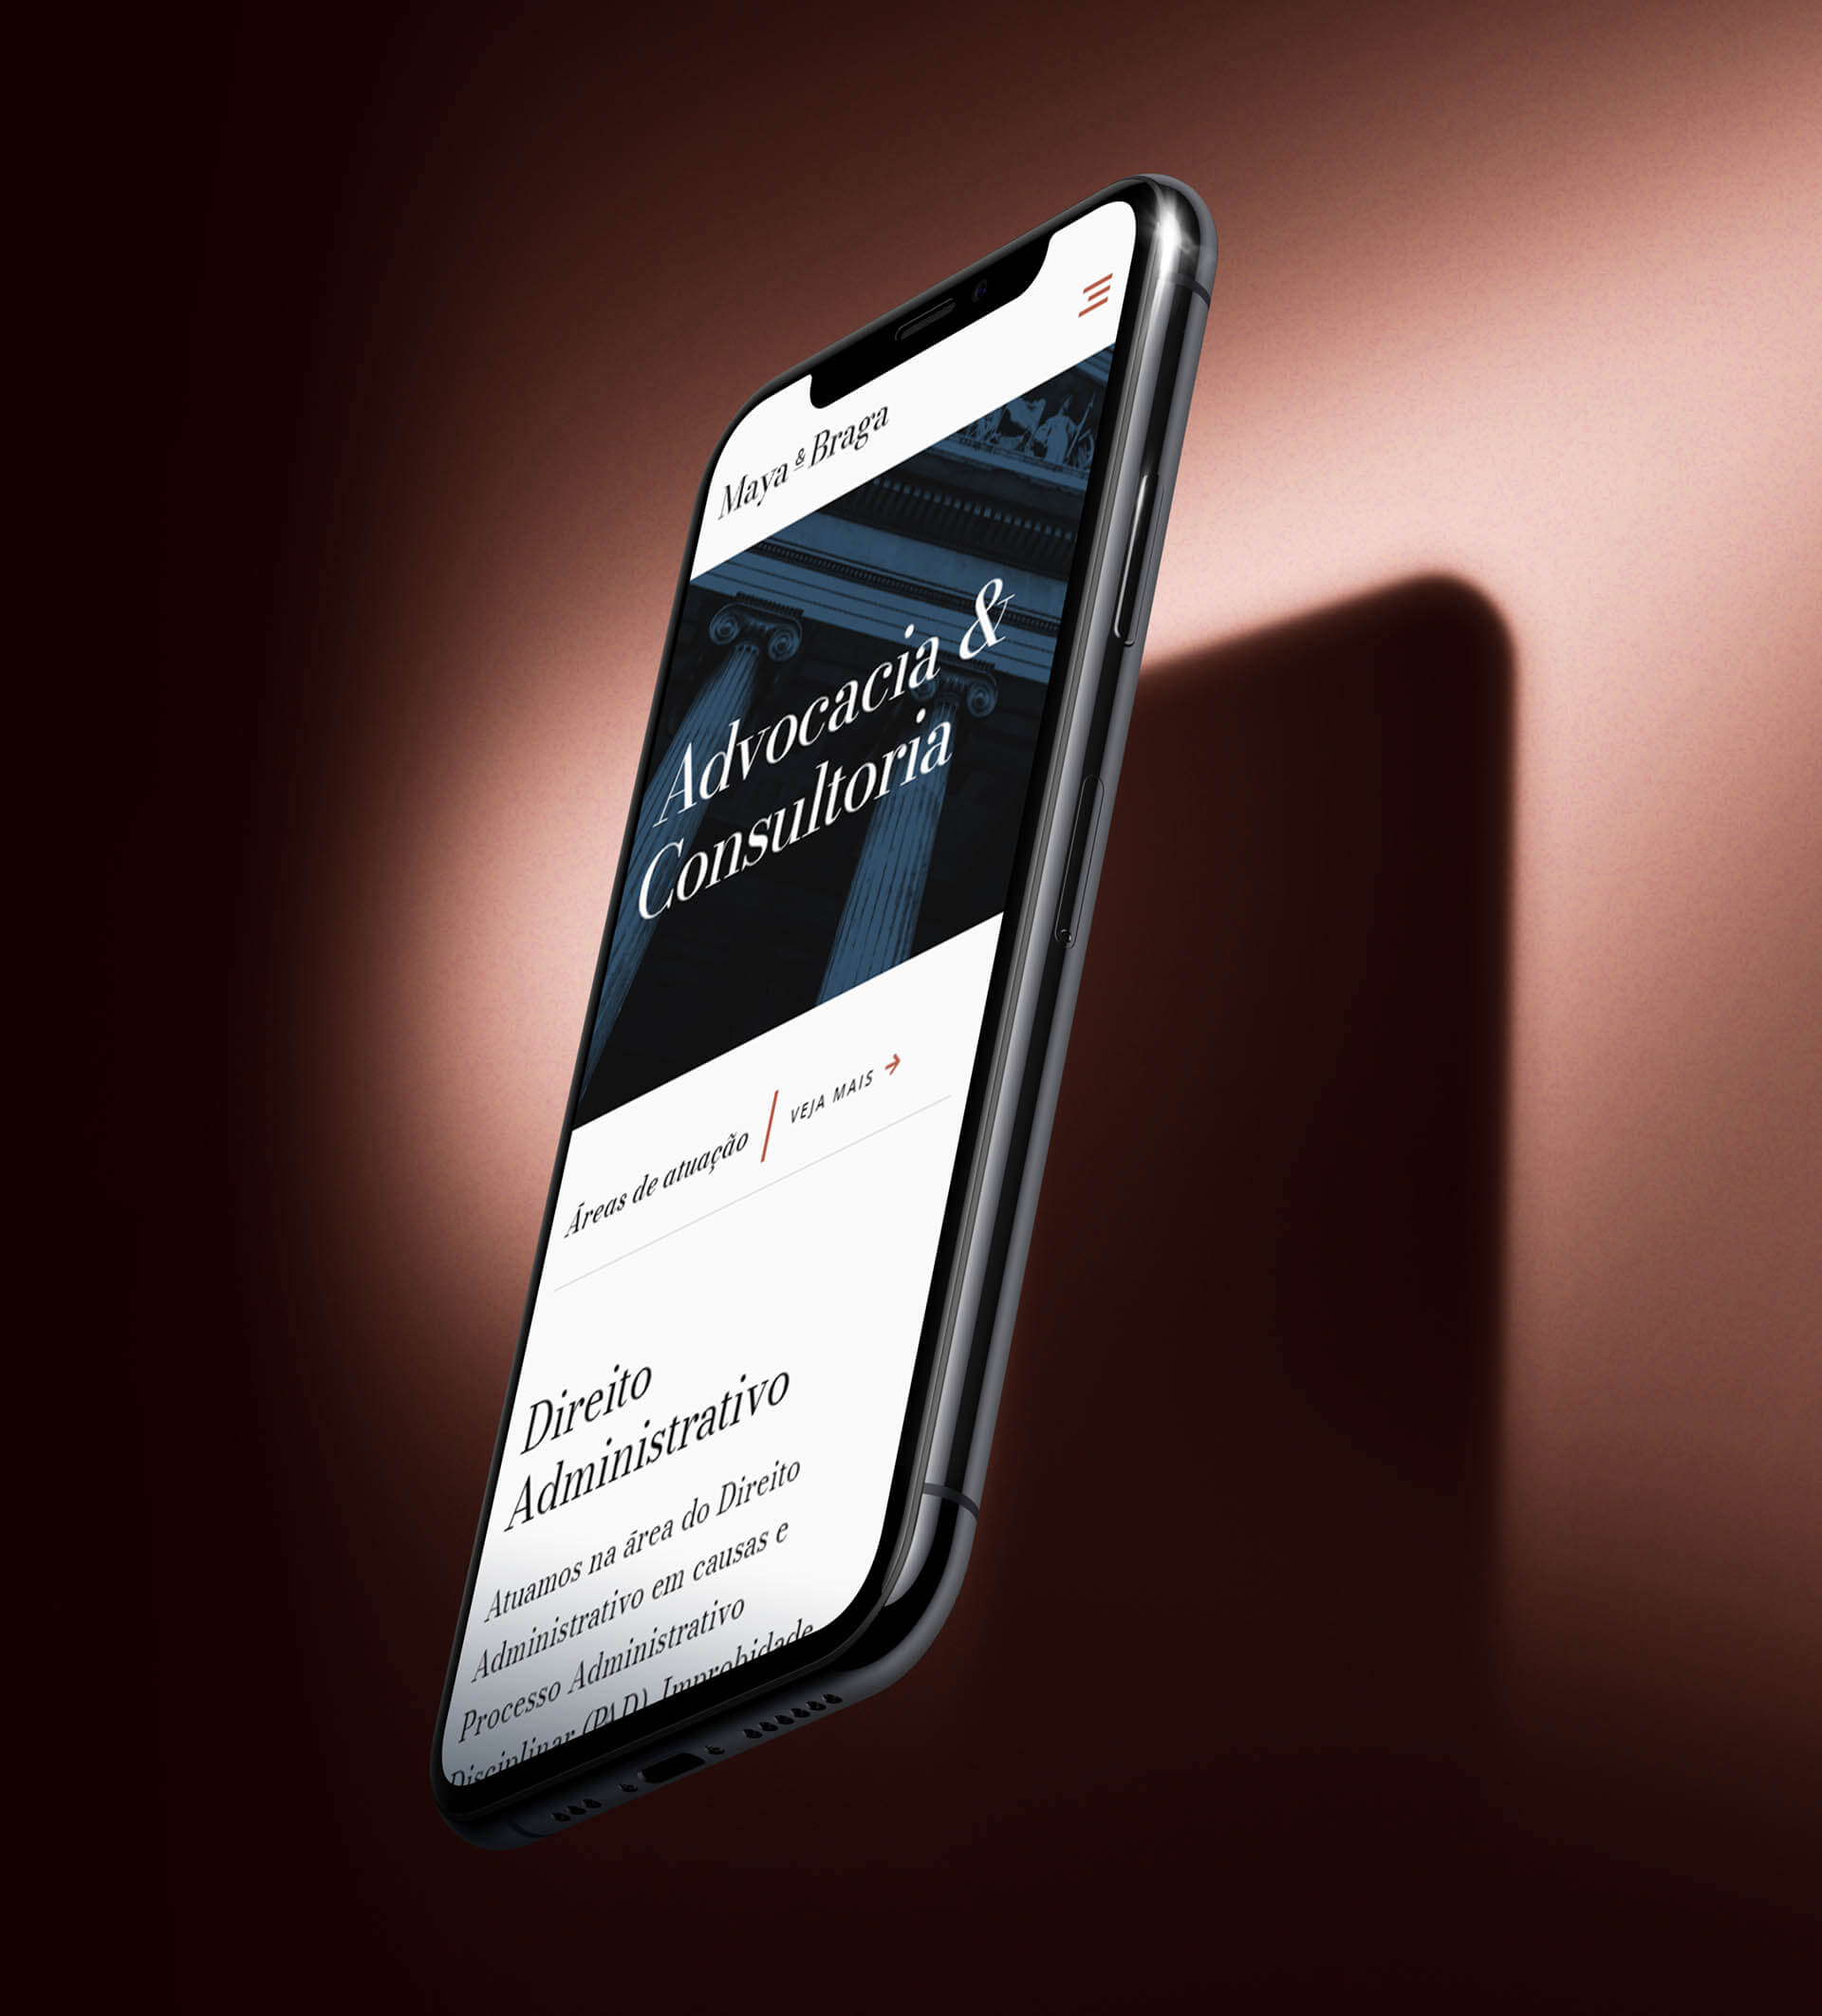 Maya e Braga's homepage on mobile